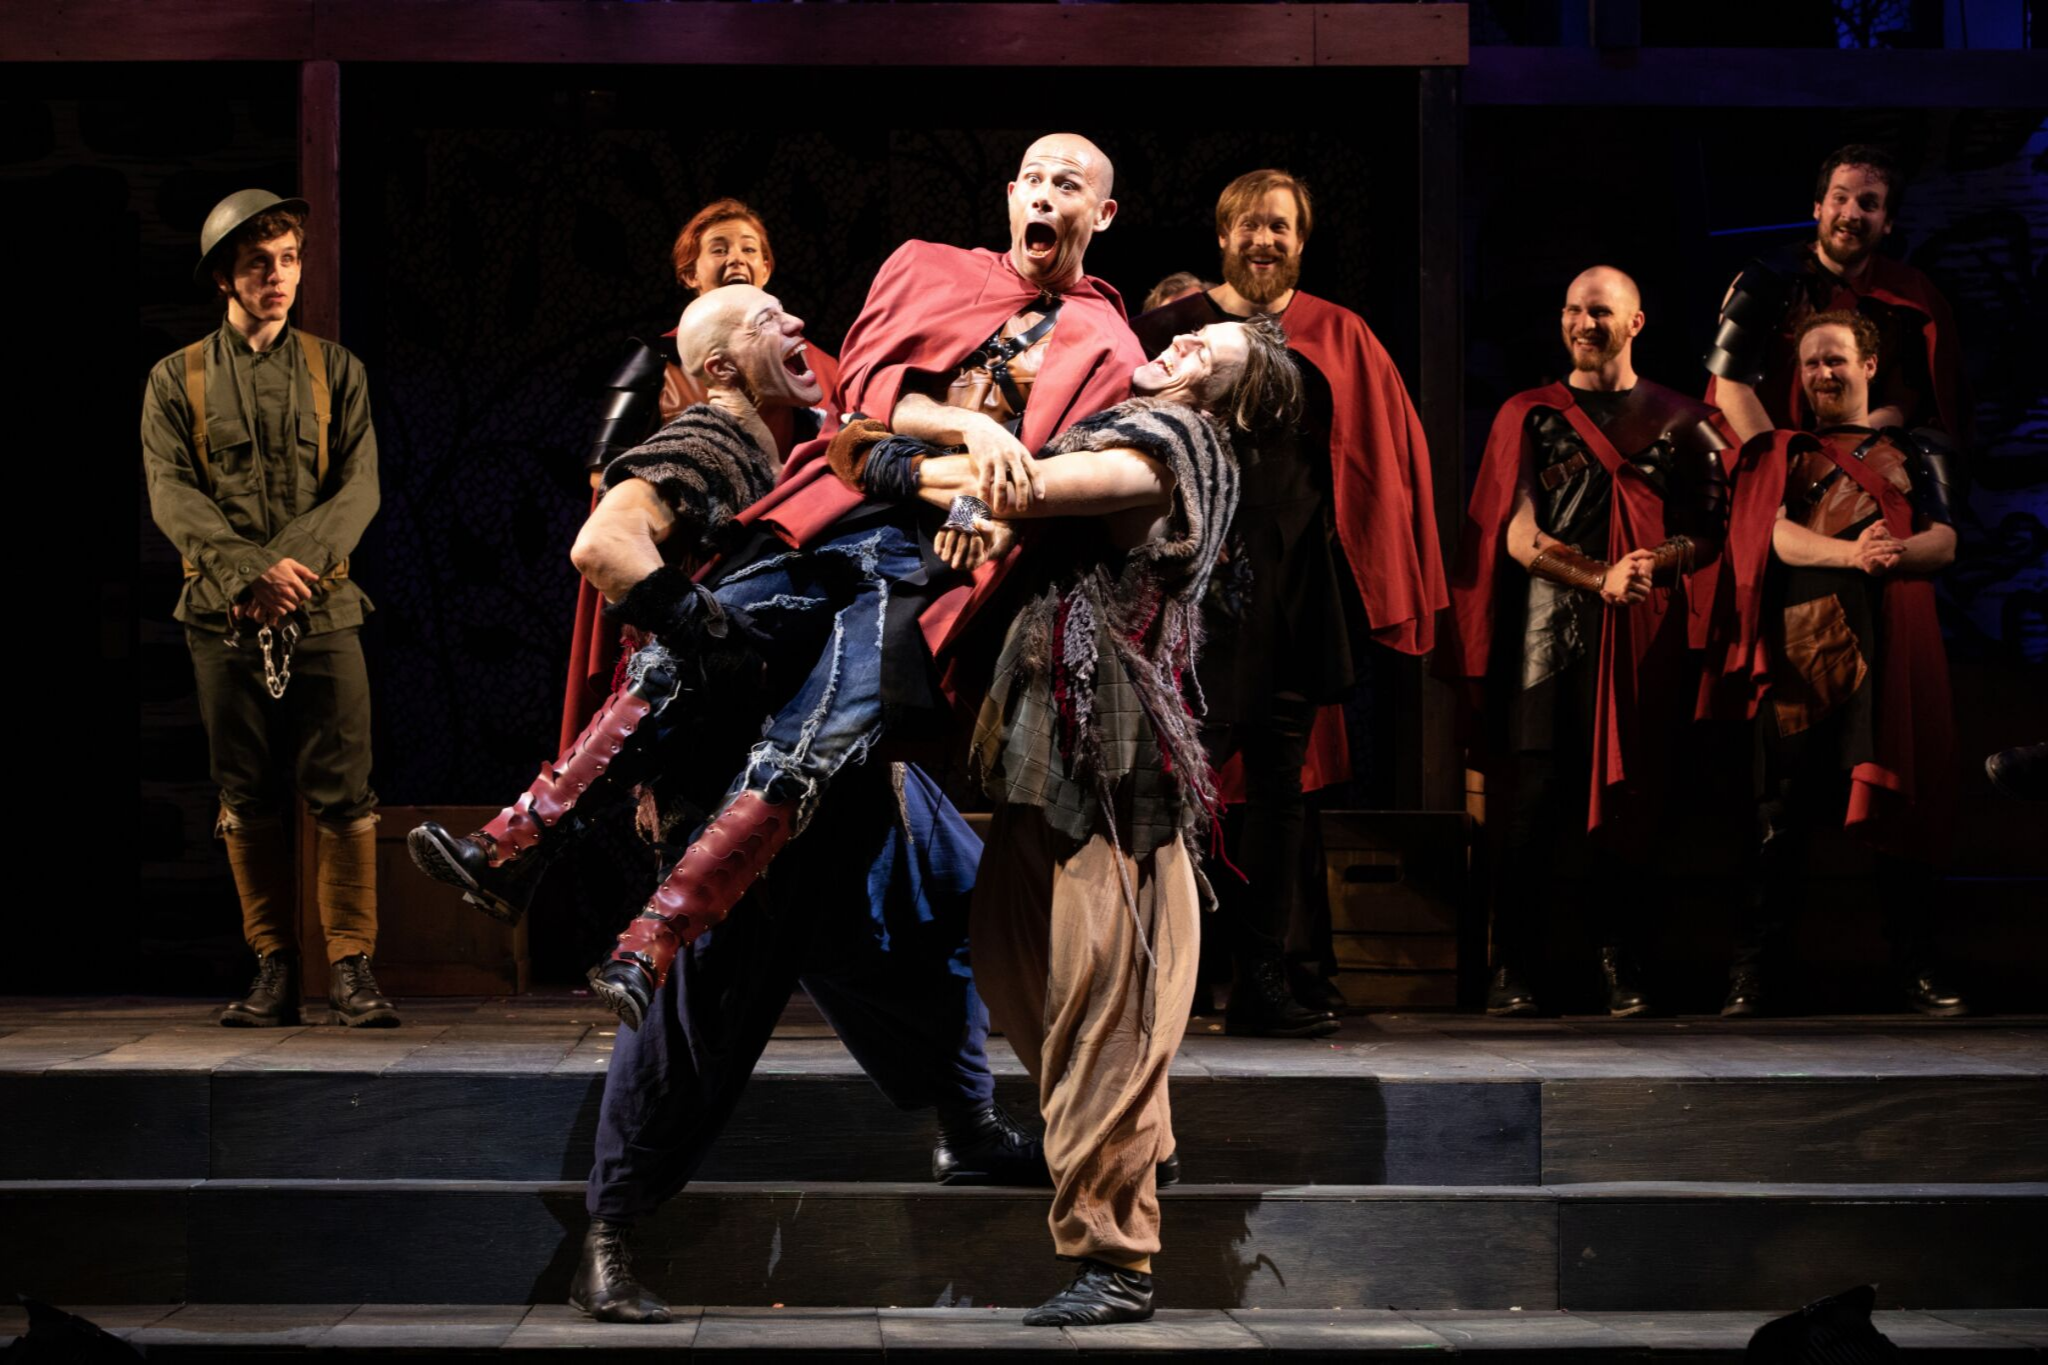 Jonathan Higginbotham (Guiderius), Daniel Duque-Estrada (Posthumus), and Michael Underhill as Arviragus in Cymbeline, Shakespeare on the Common 2019-Photo by Evgenia Eliseeva